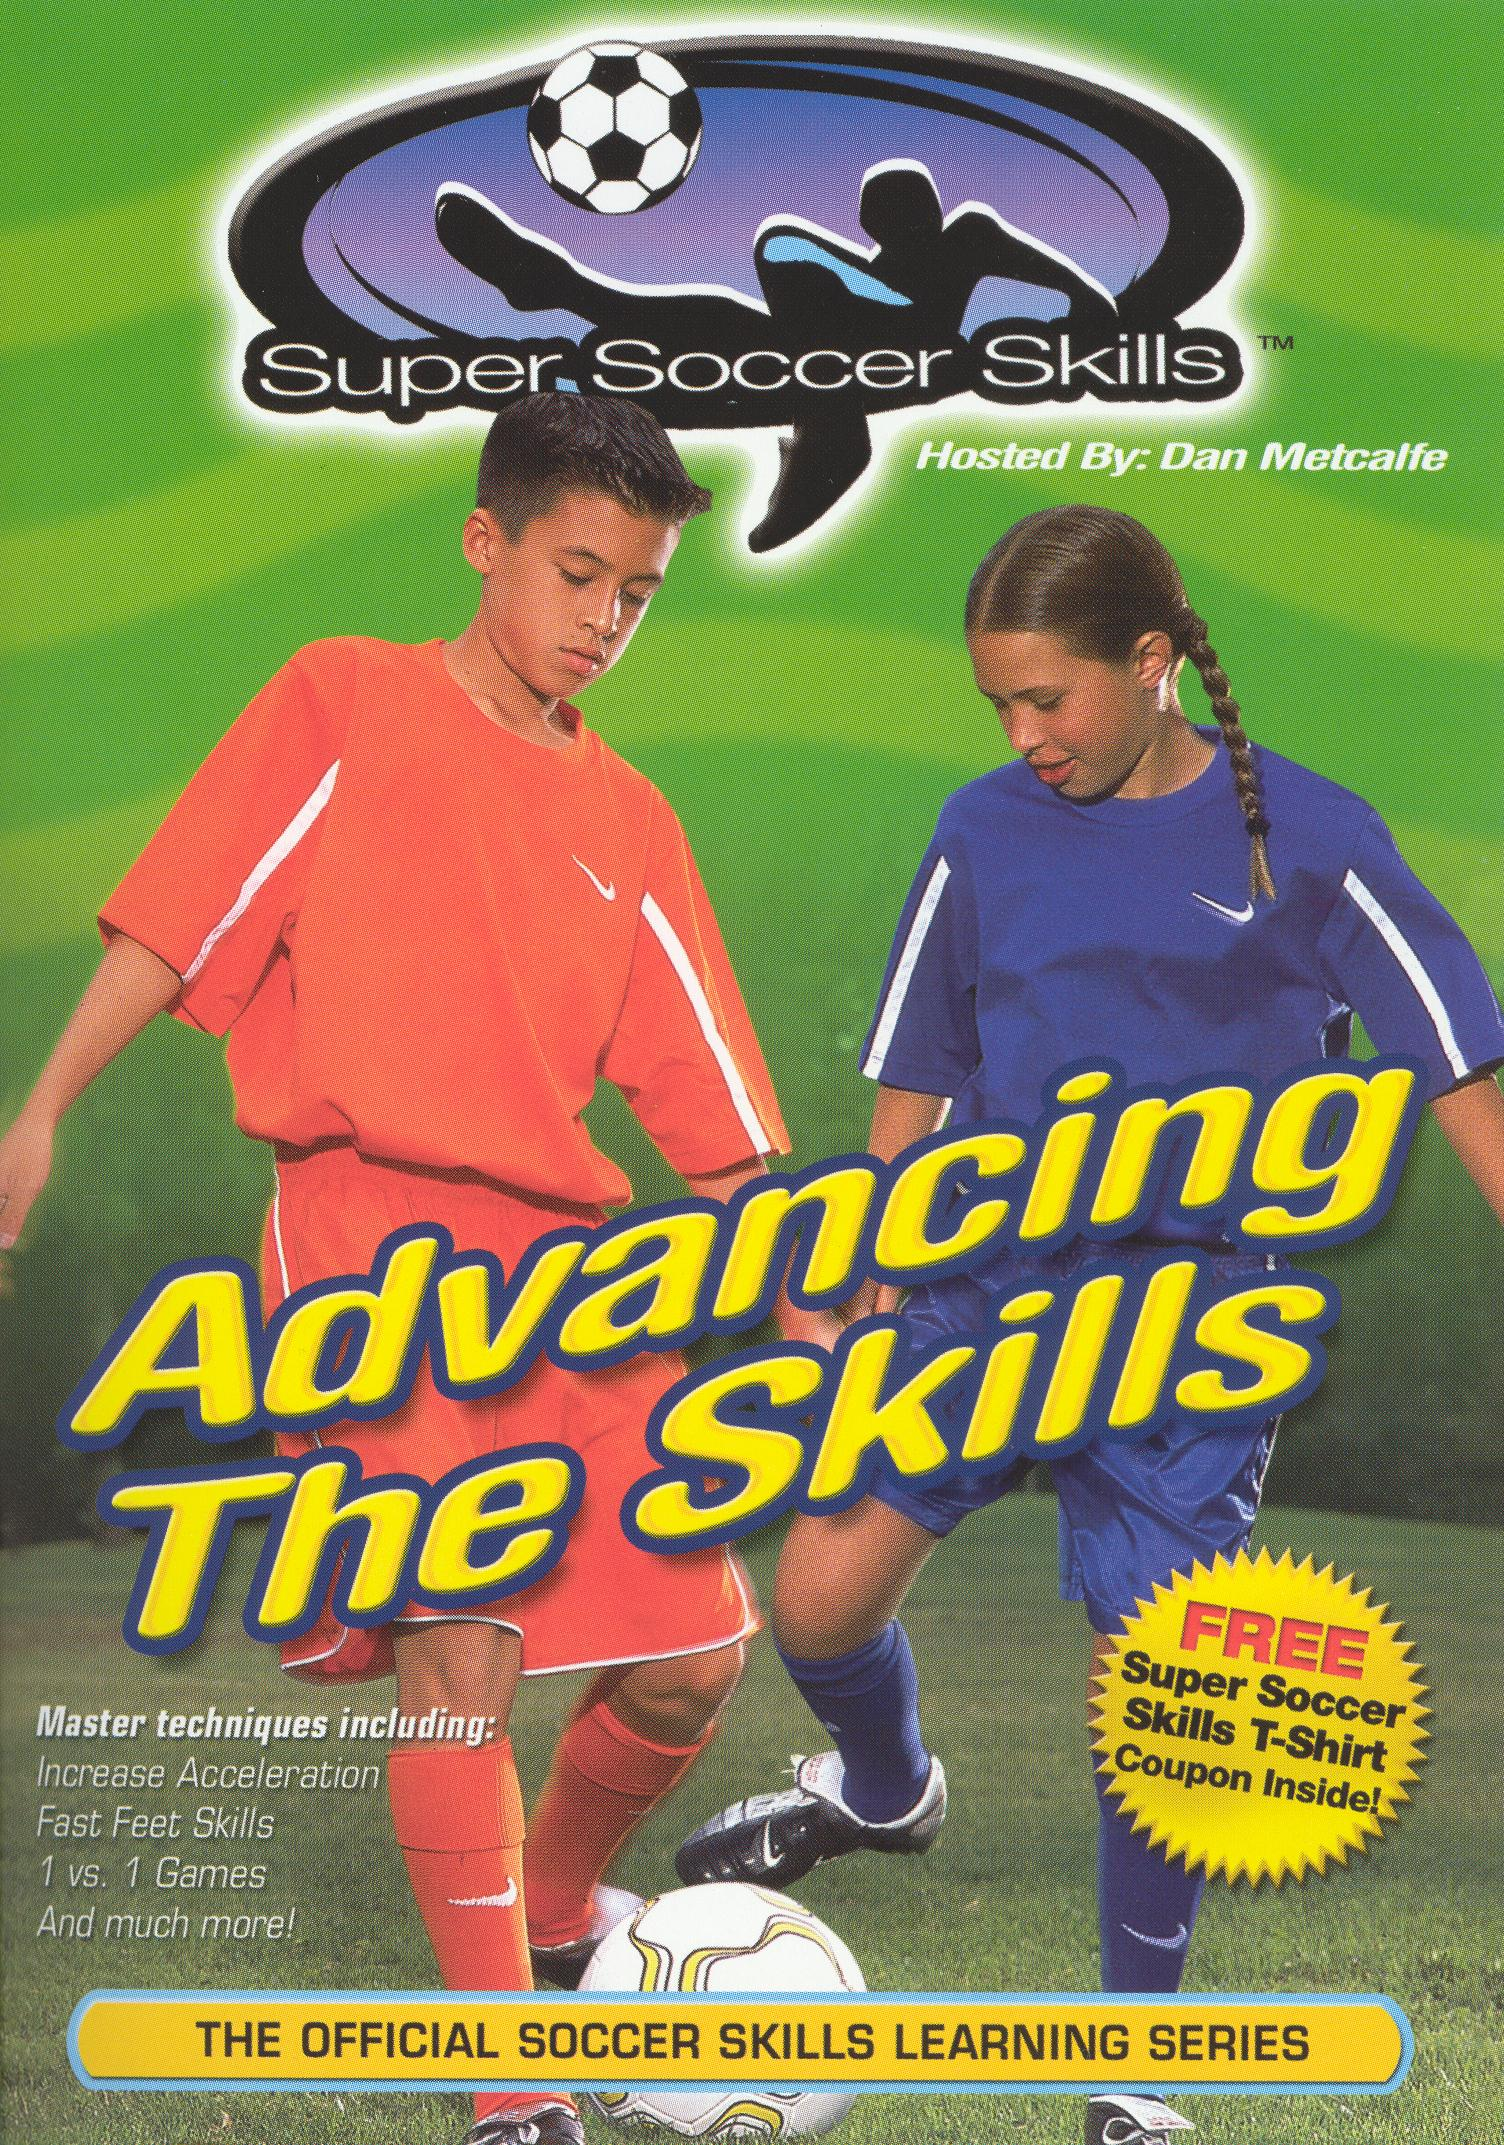 Super Soccer Skills: Advancing the Skills